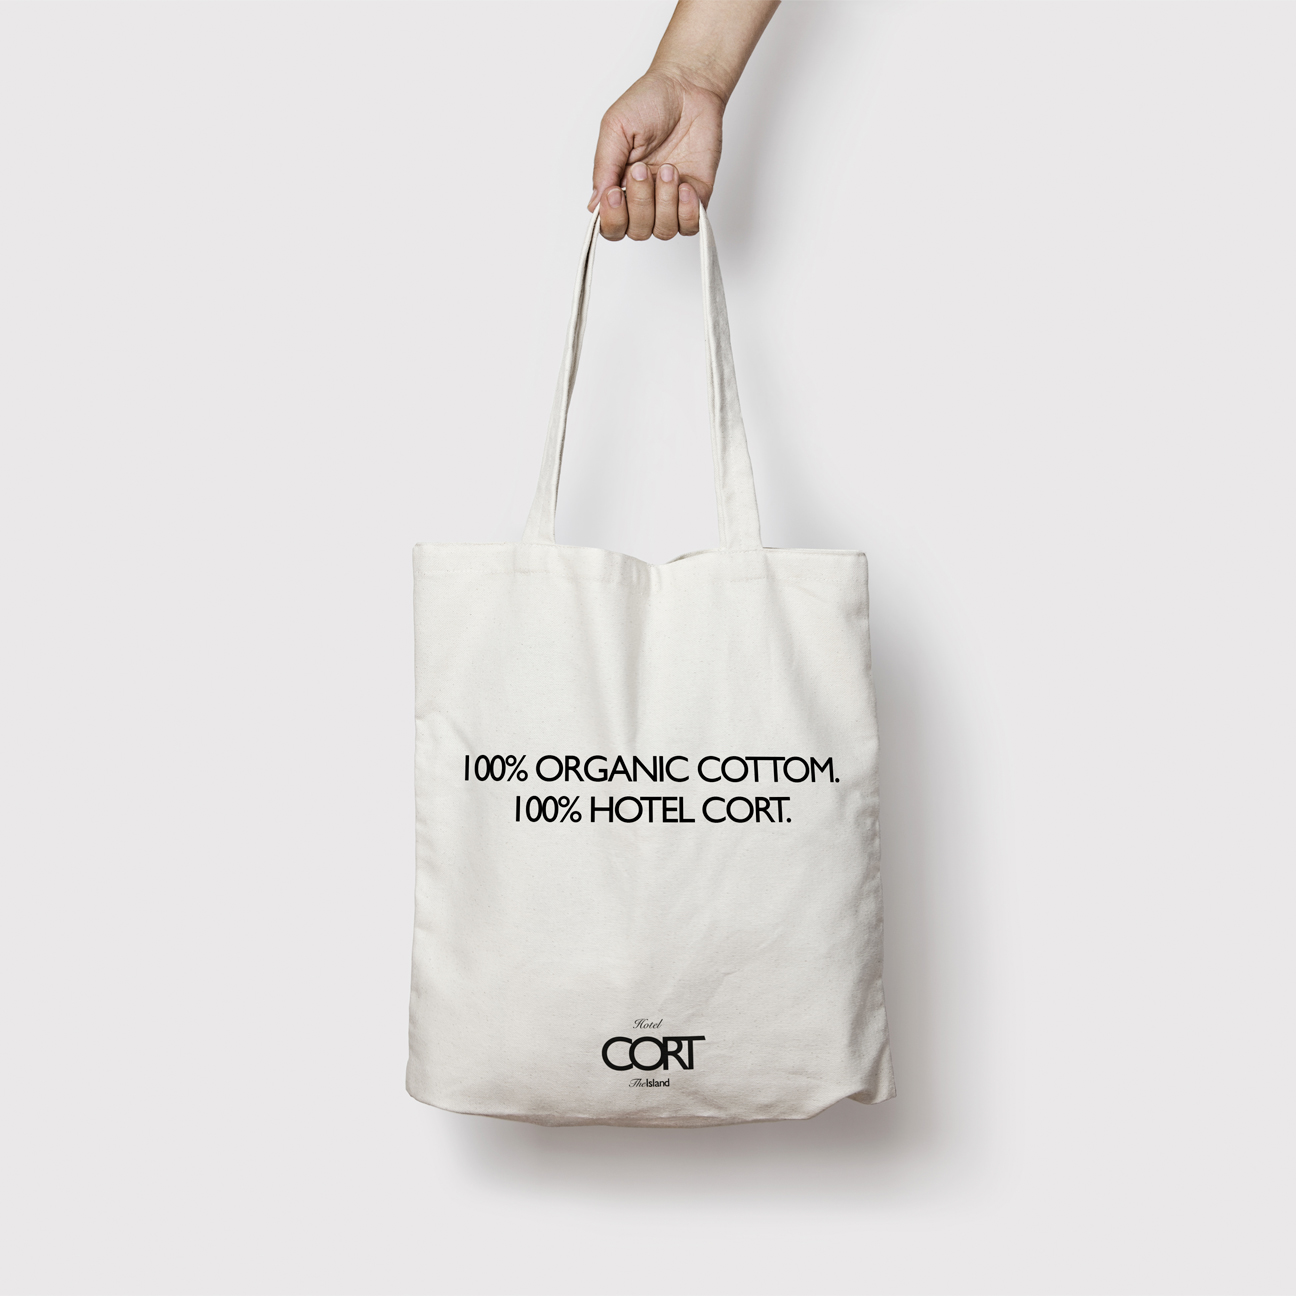 hotel-cort-bolsas-clientes-organic